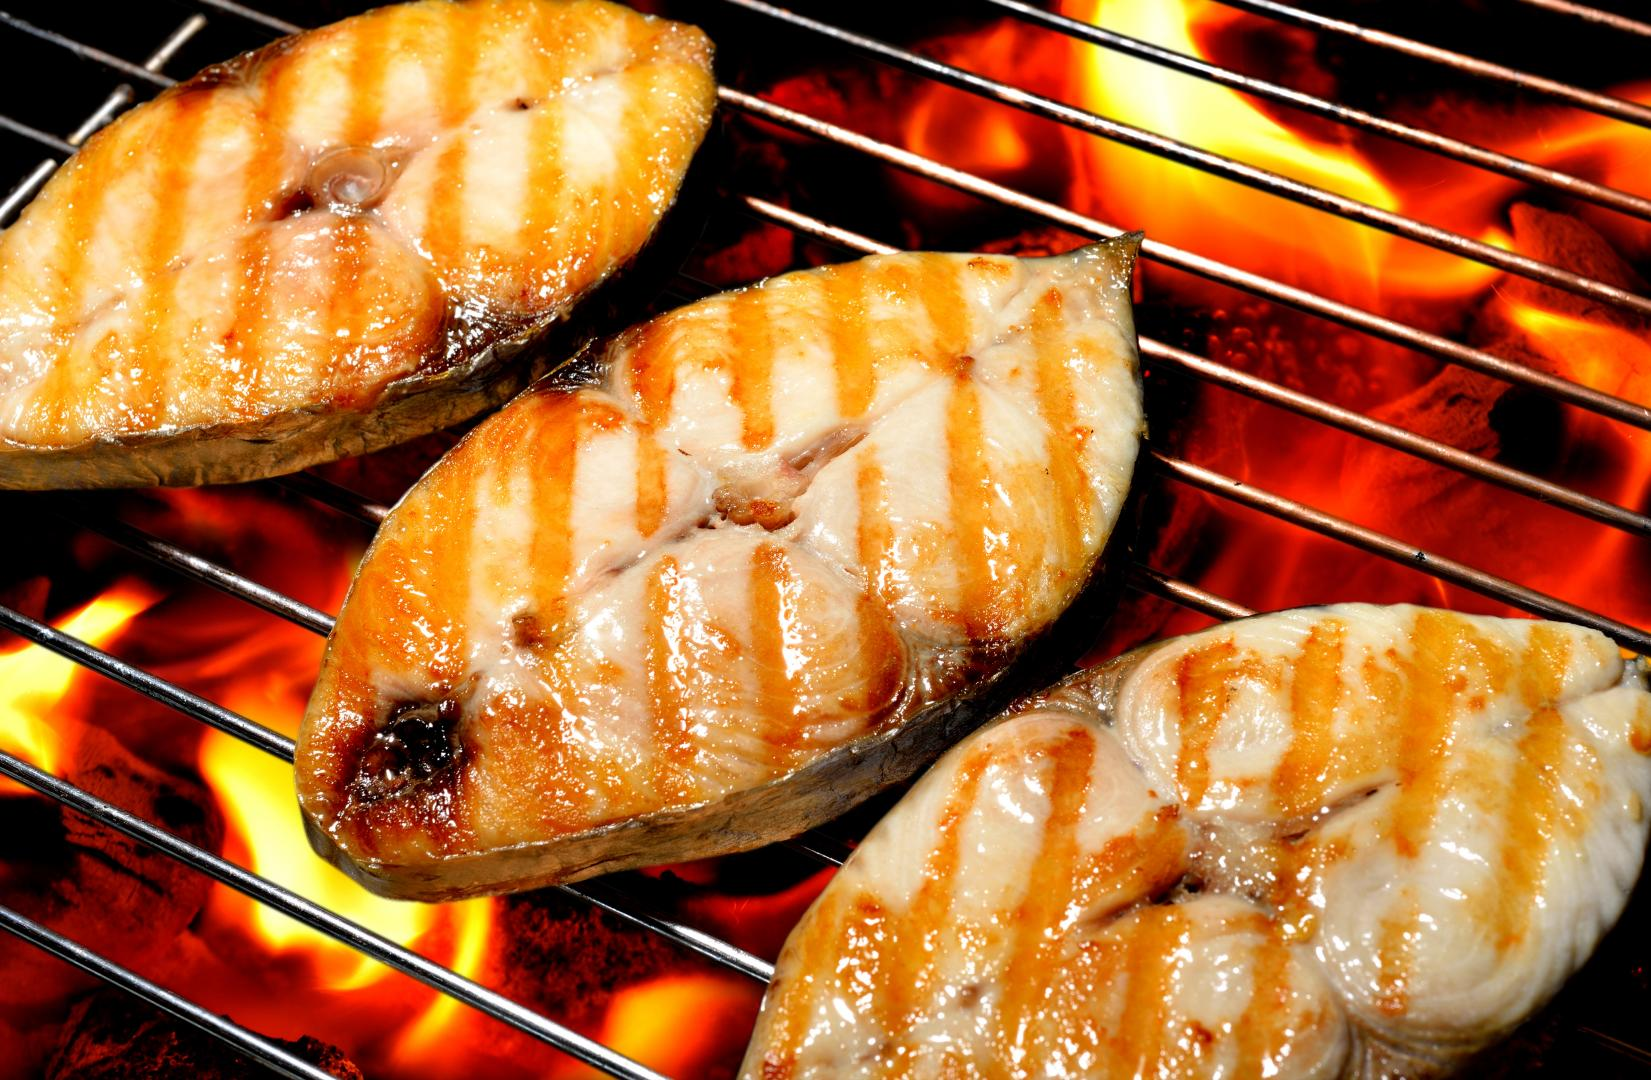 Restaurant poisson grill sainte anne grande terre le moule poncho grill - Restaurant poisson grille paris ...